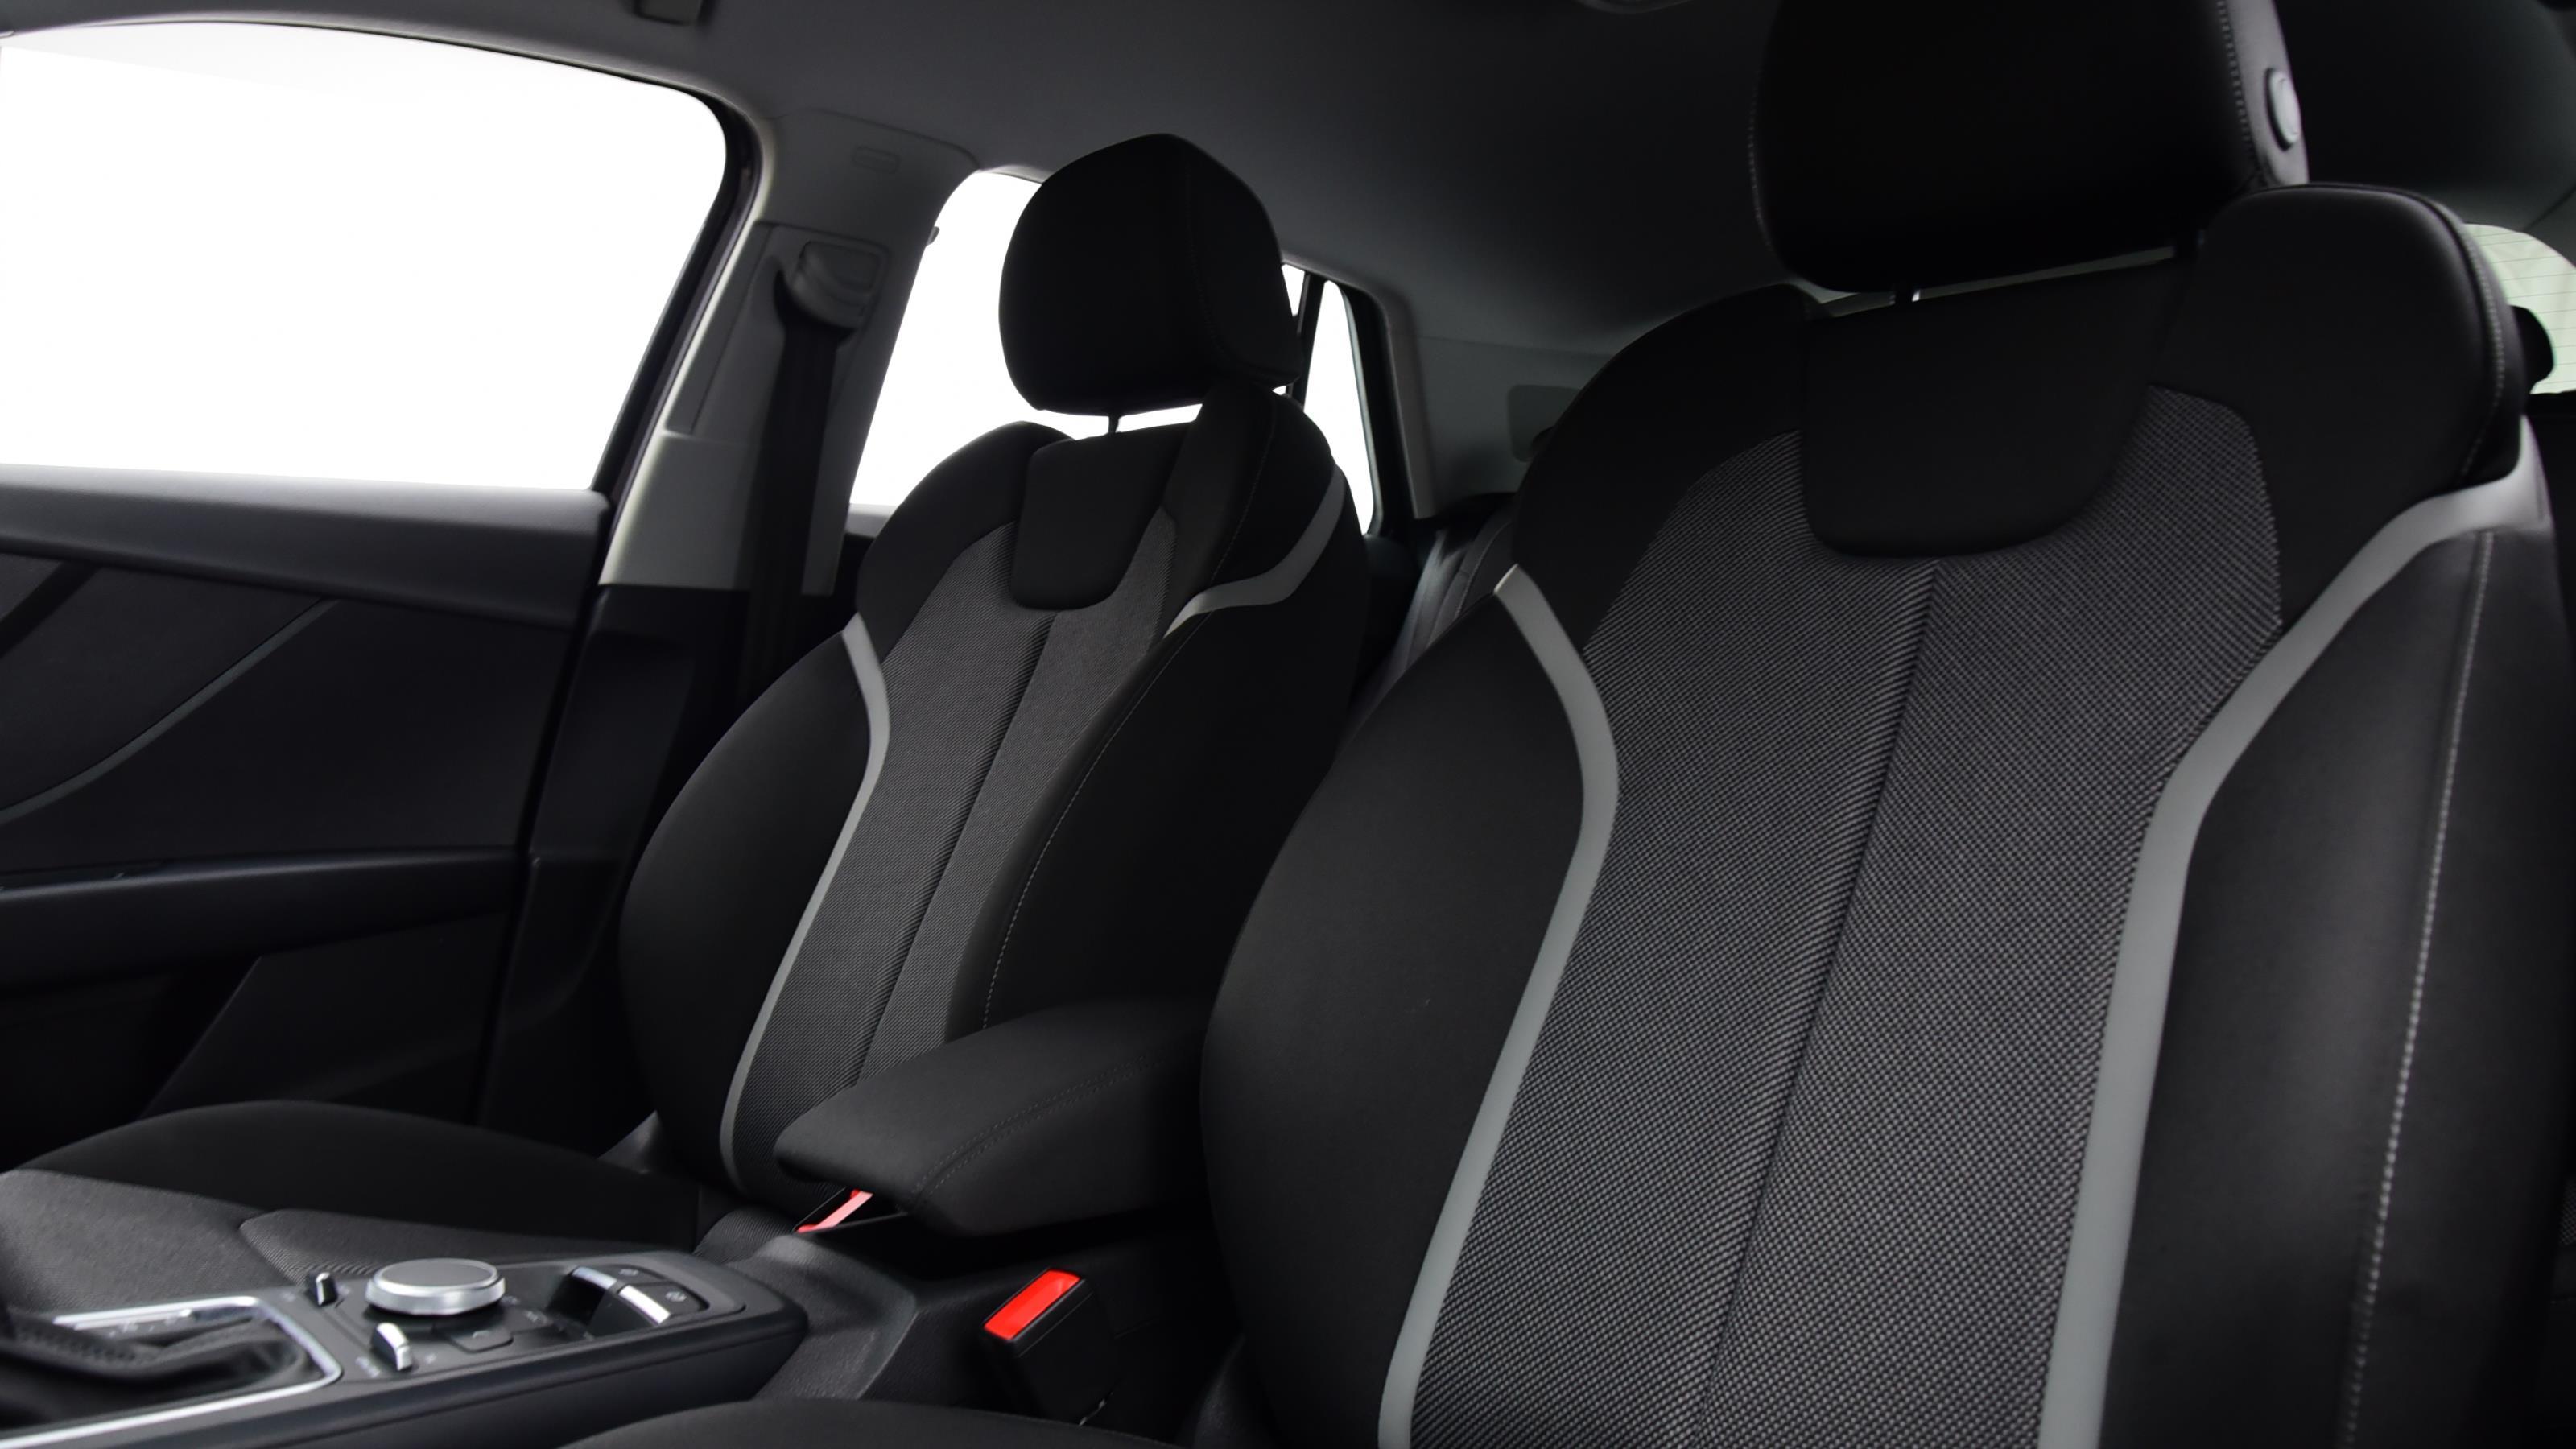 Used 2017 Audi Q2 1.4 TFSI Sport 5dr S Tronic BLACK at Saxton4x4